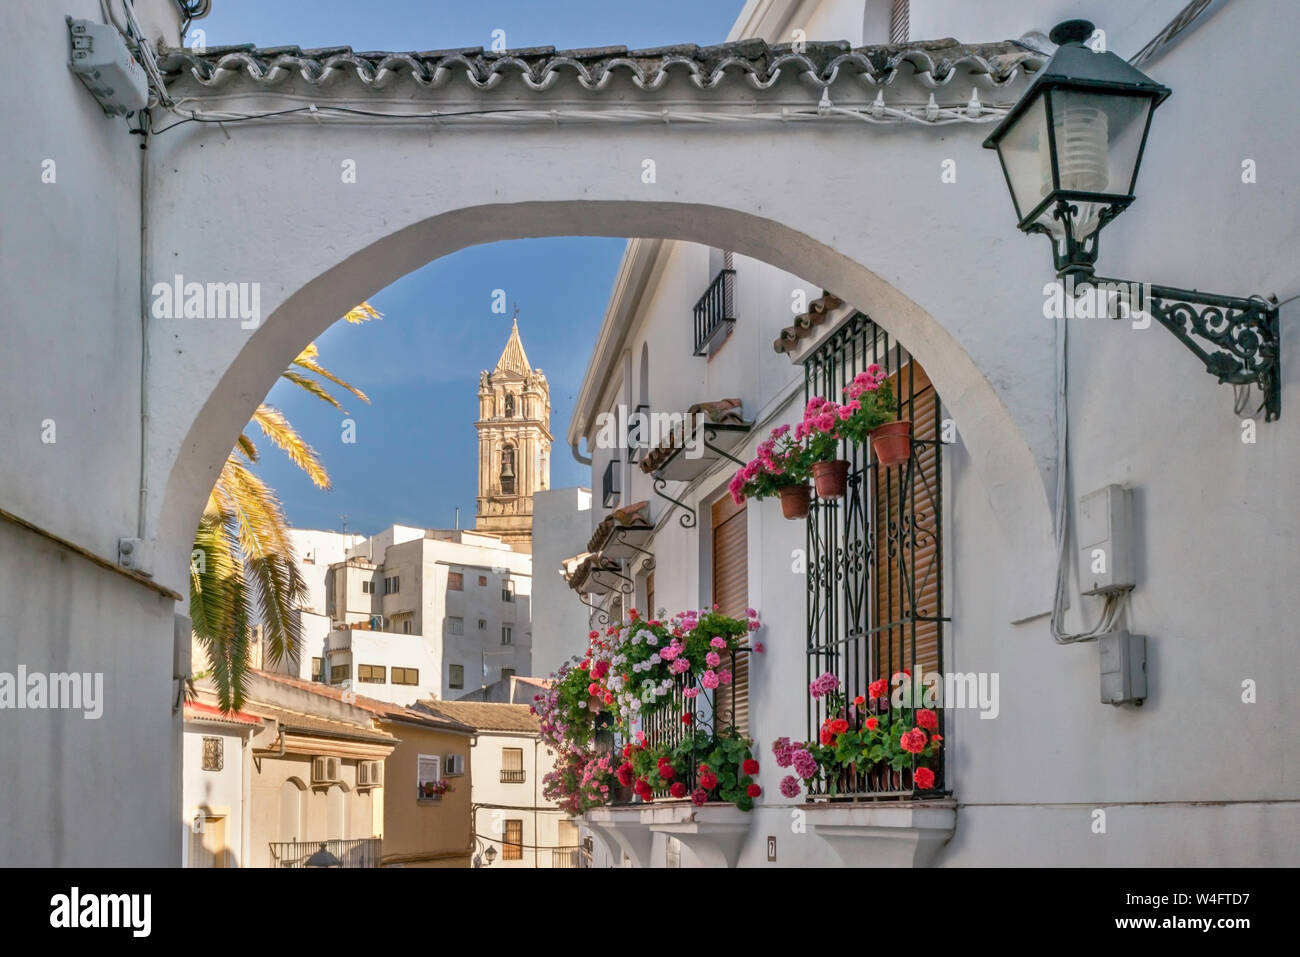 Cuesta de San Juan, alleyway with buttress between buildings, Iglesia de la Asuncion in distance, in Cabra, Cordoba Province, Andalusia, Spain Stock Photo